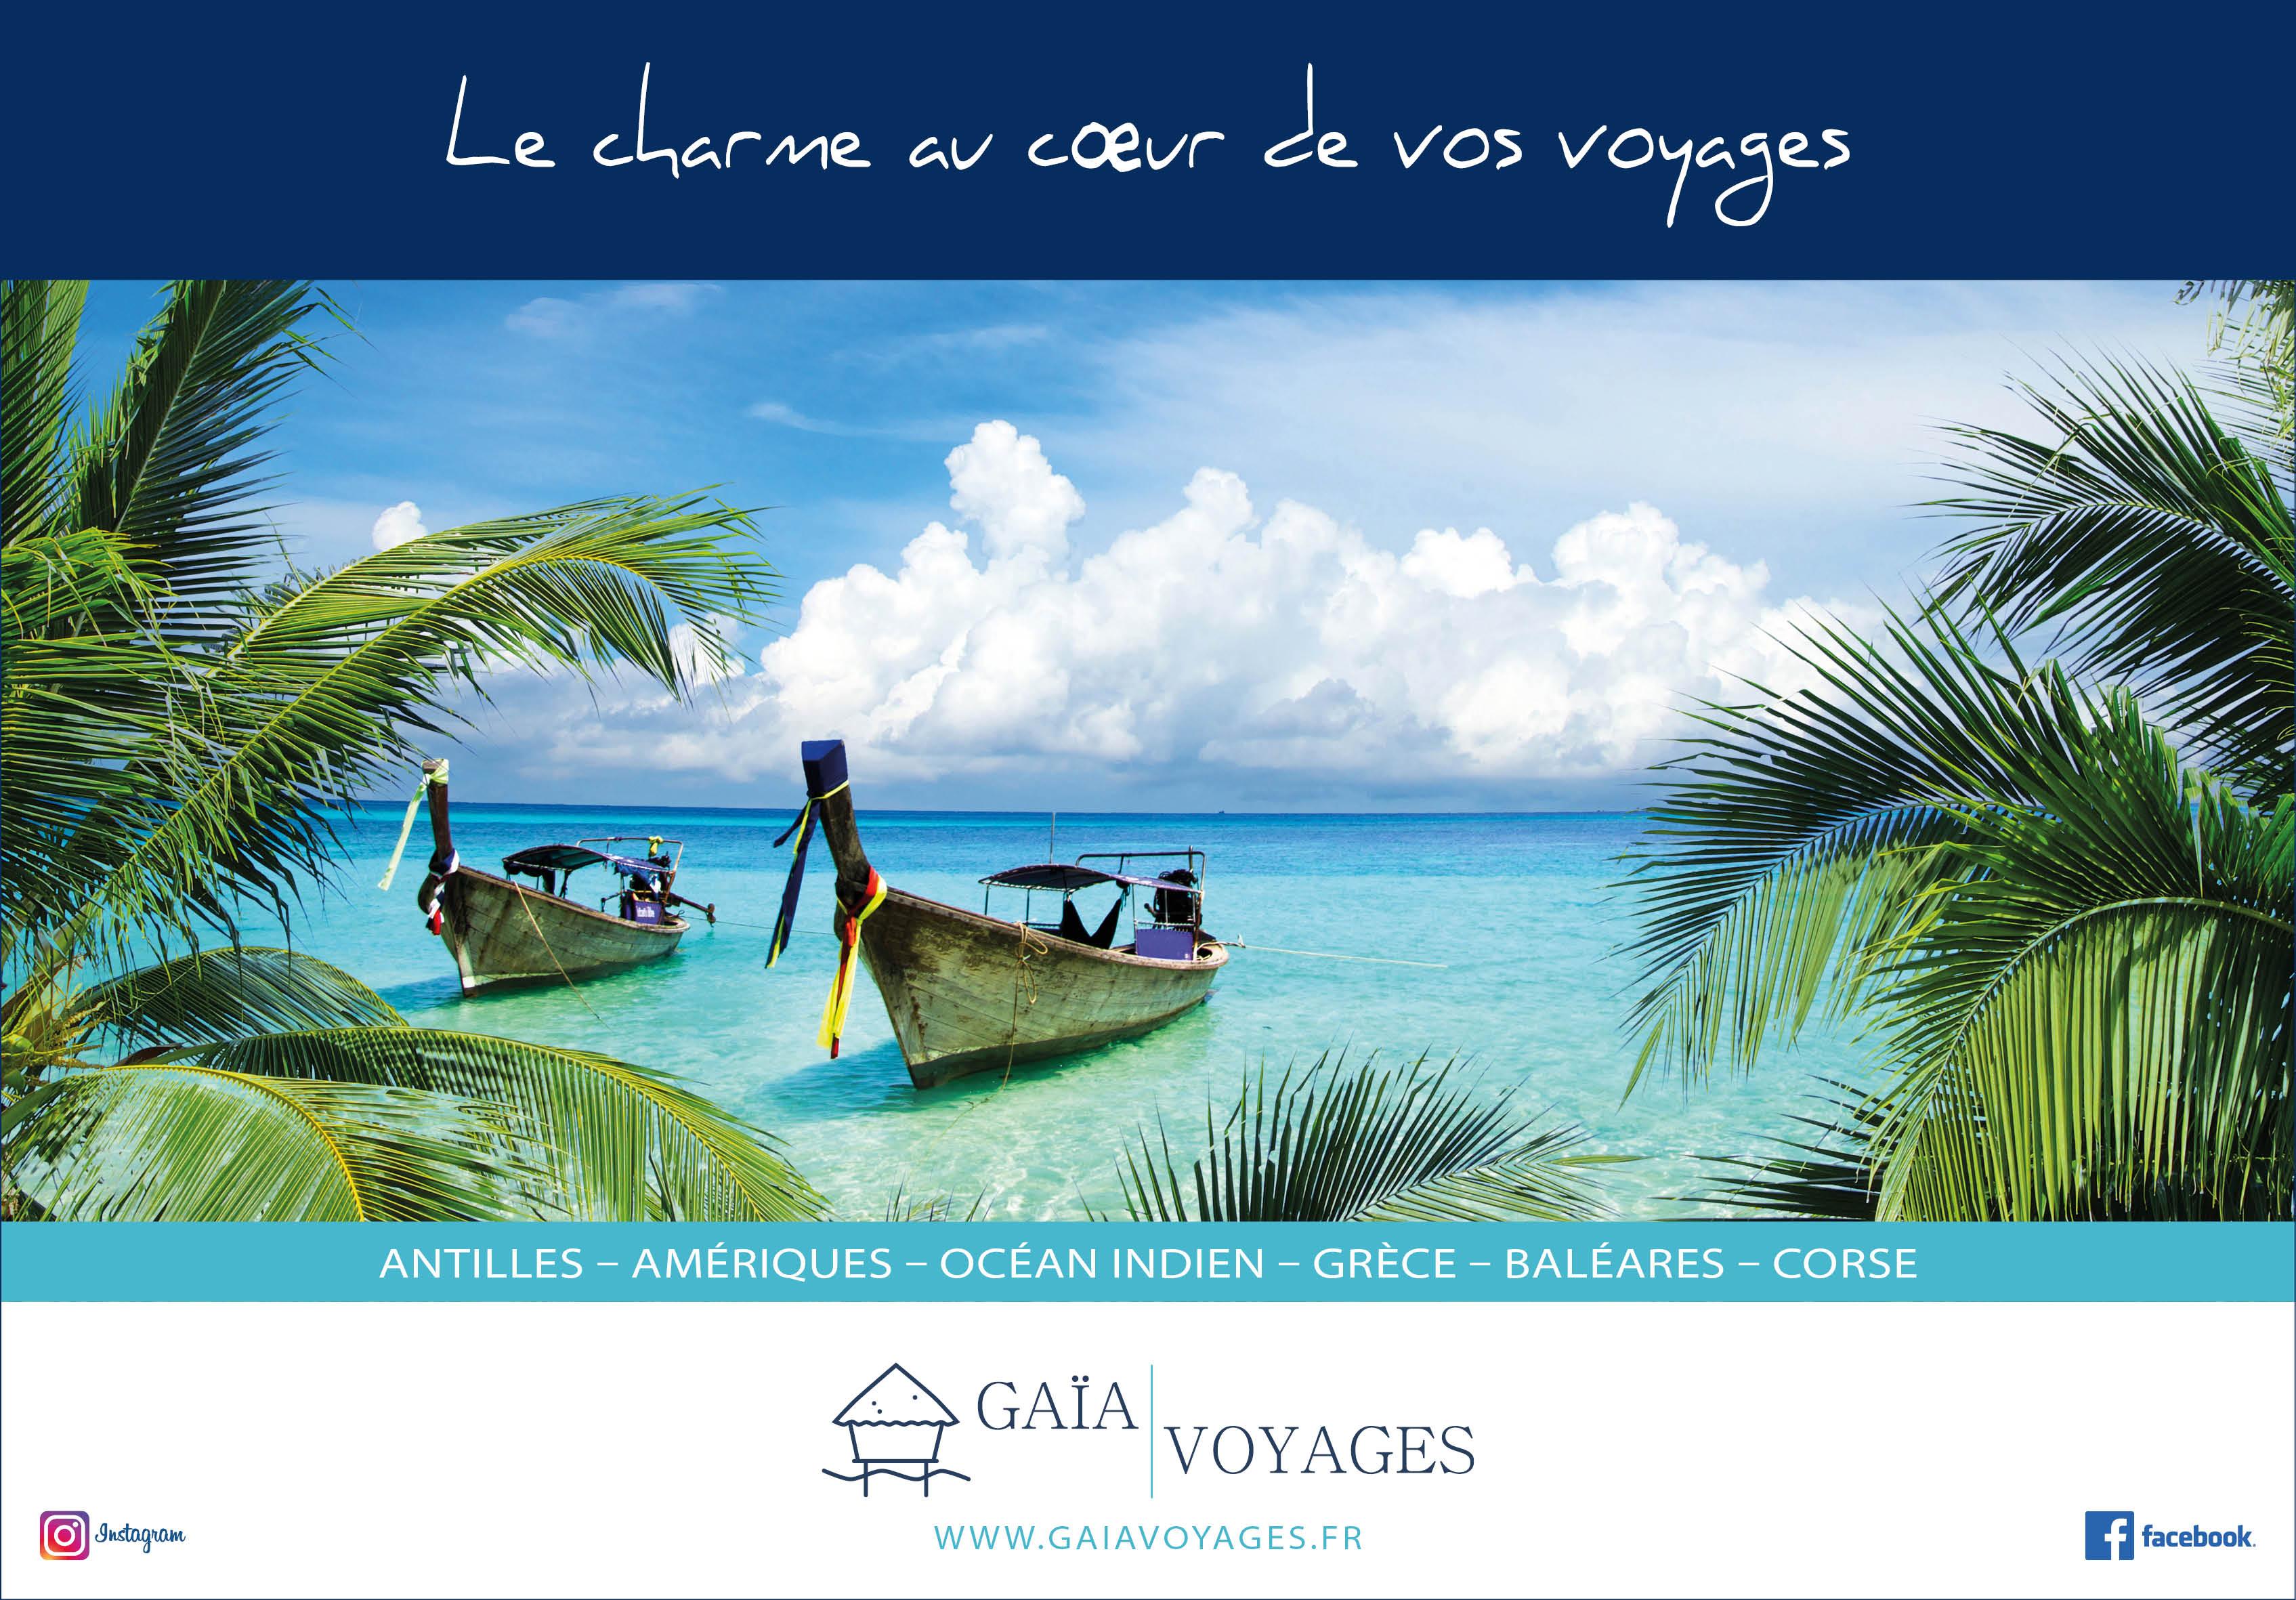 Gaïa Voyage Salon Tourissima Lille